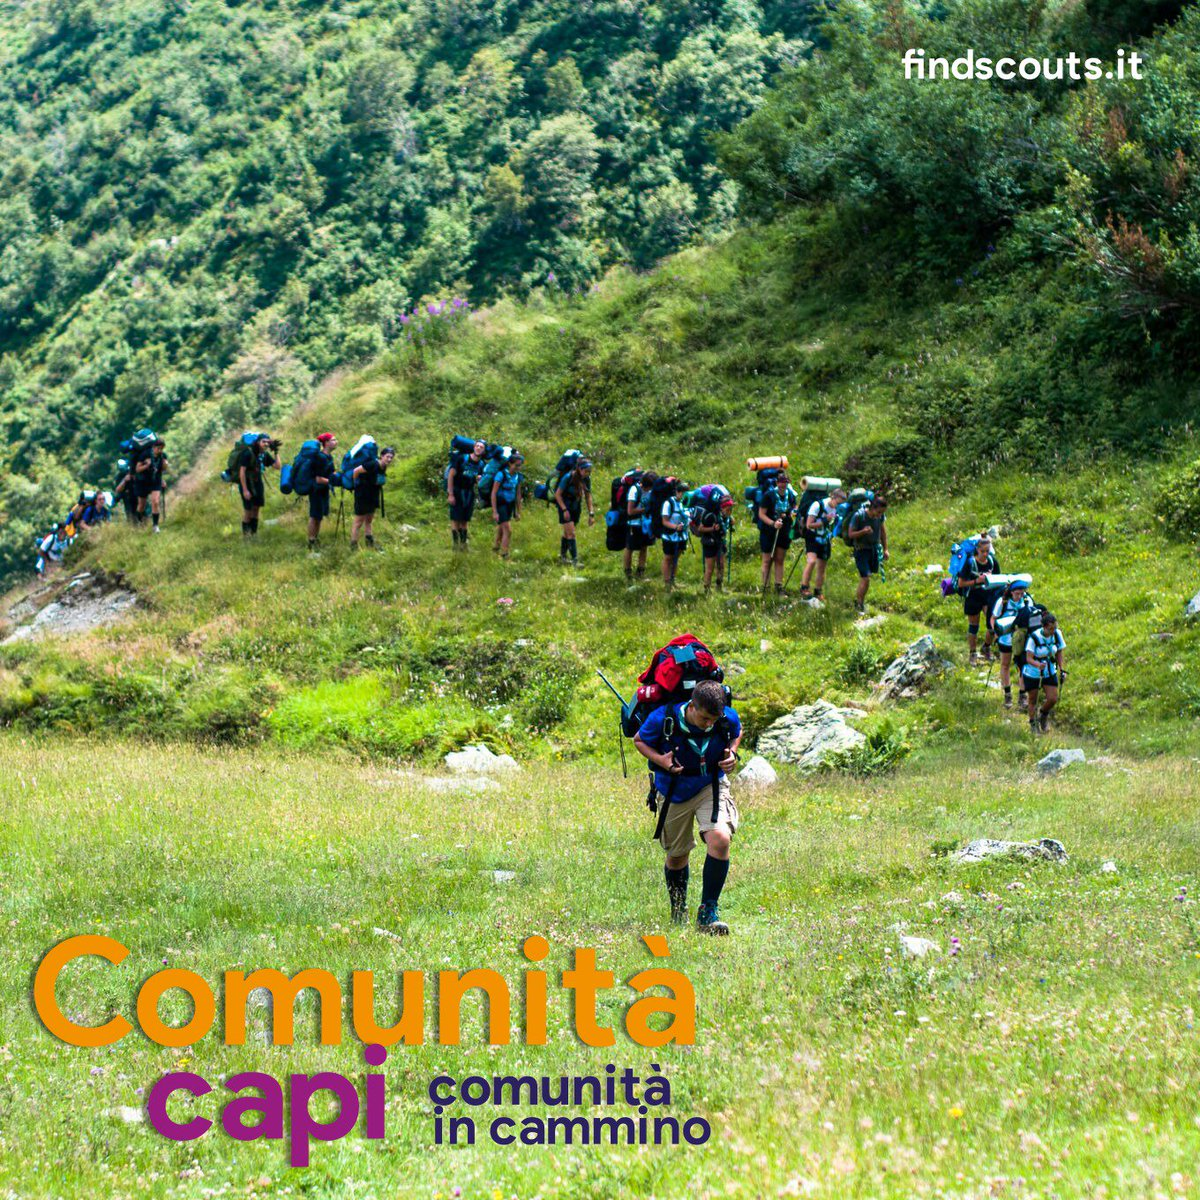 #comunitaincammino